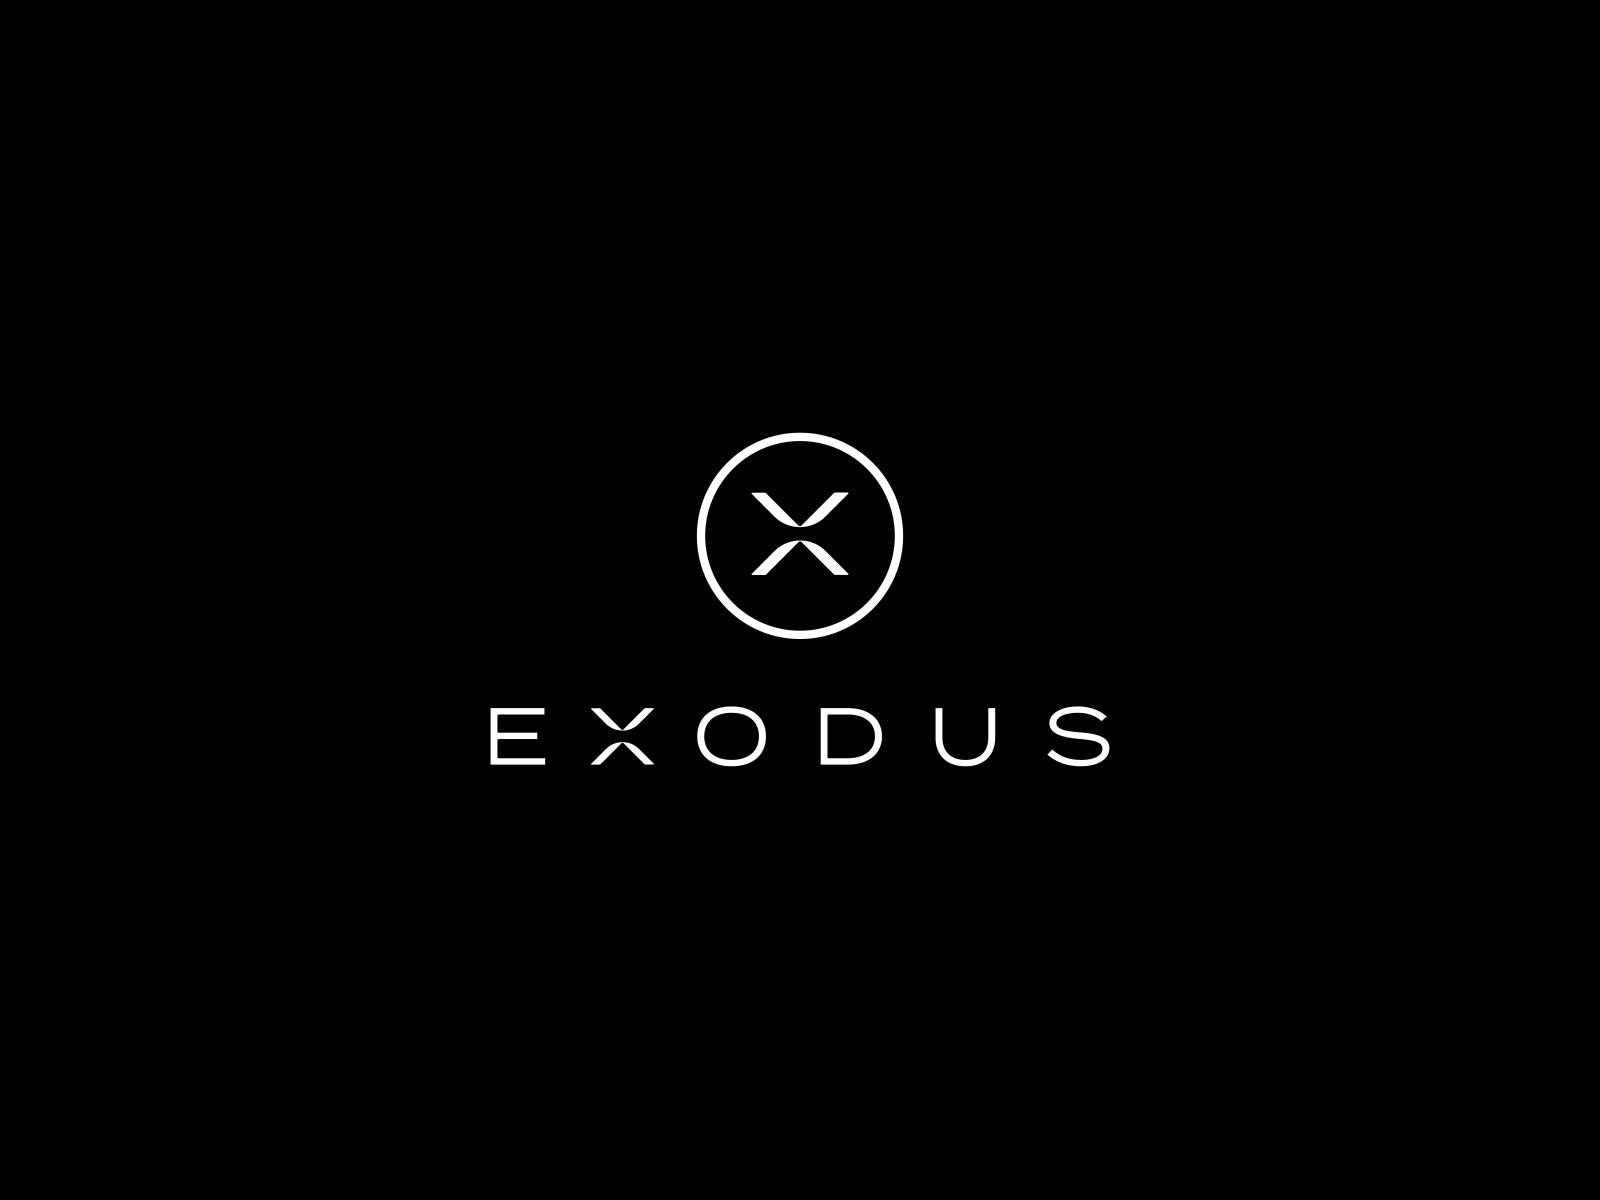 Exodus | Brand Identity